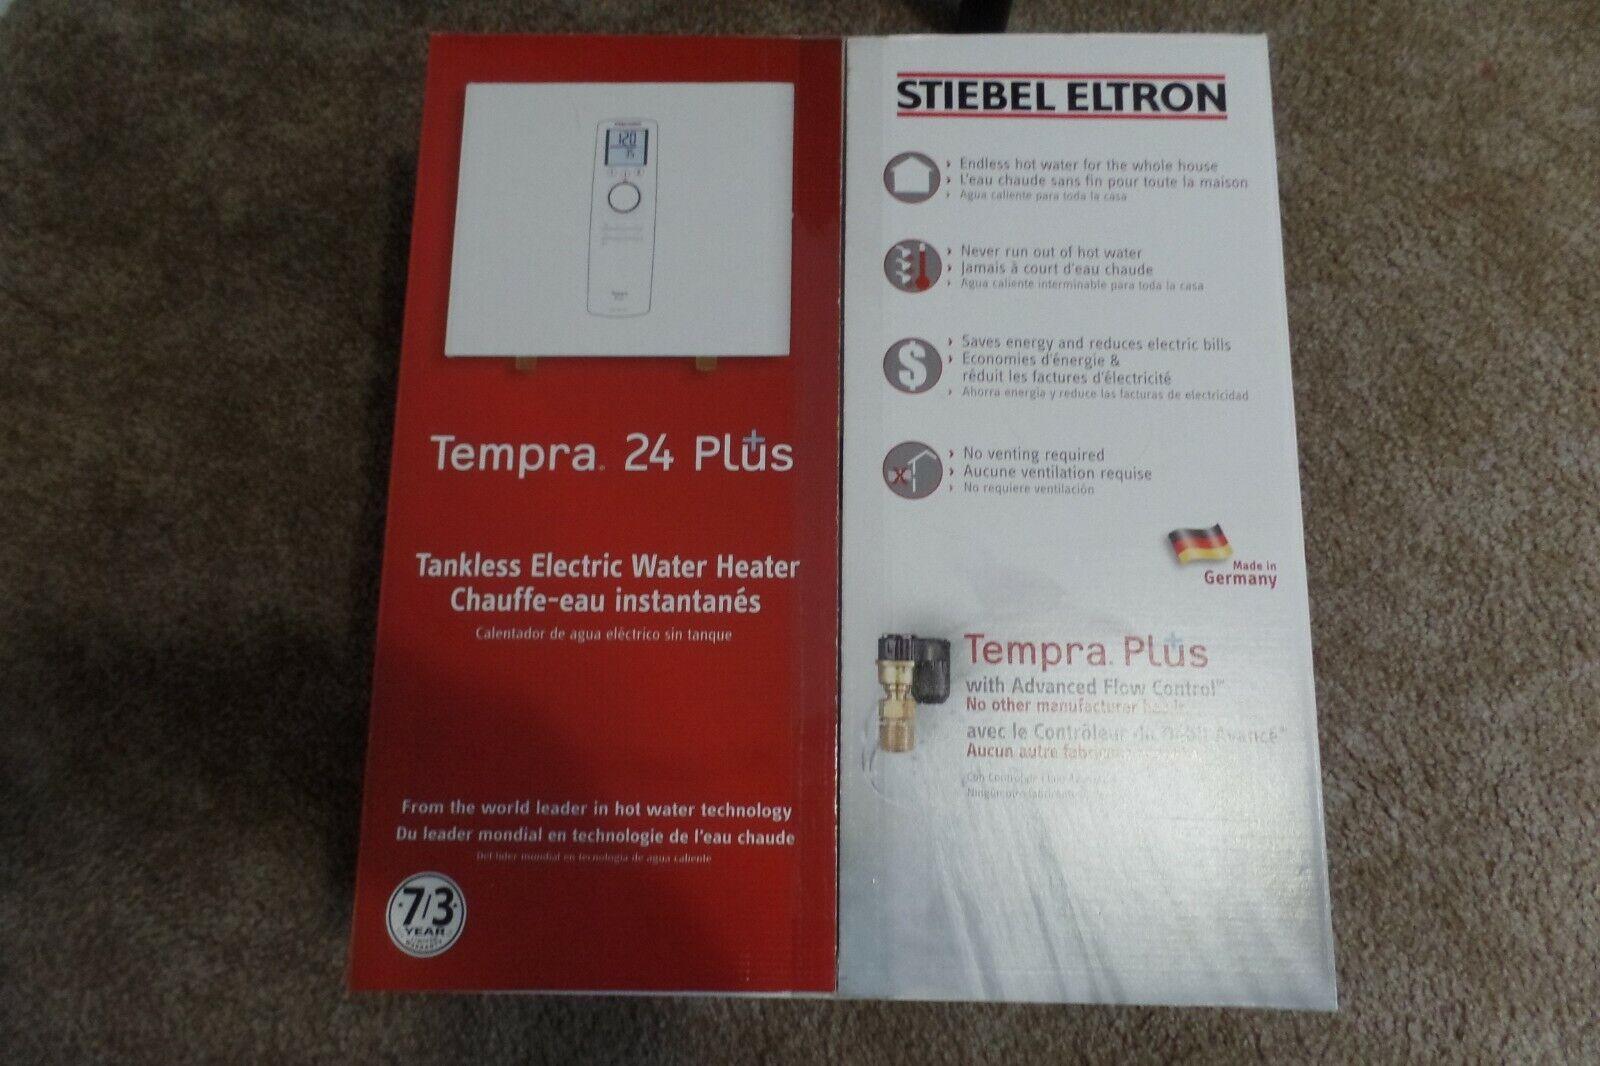 NEW! Stiebel Eltron Tempra 24 Plus Tankless Electric Water H